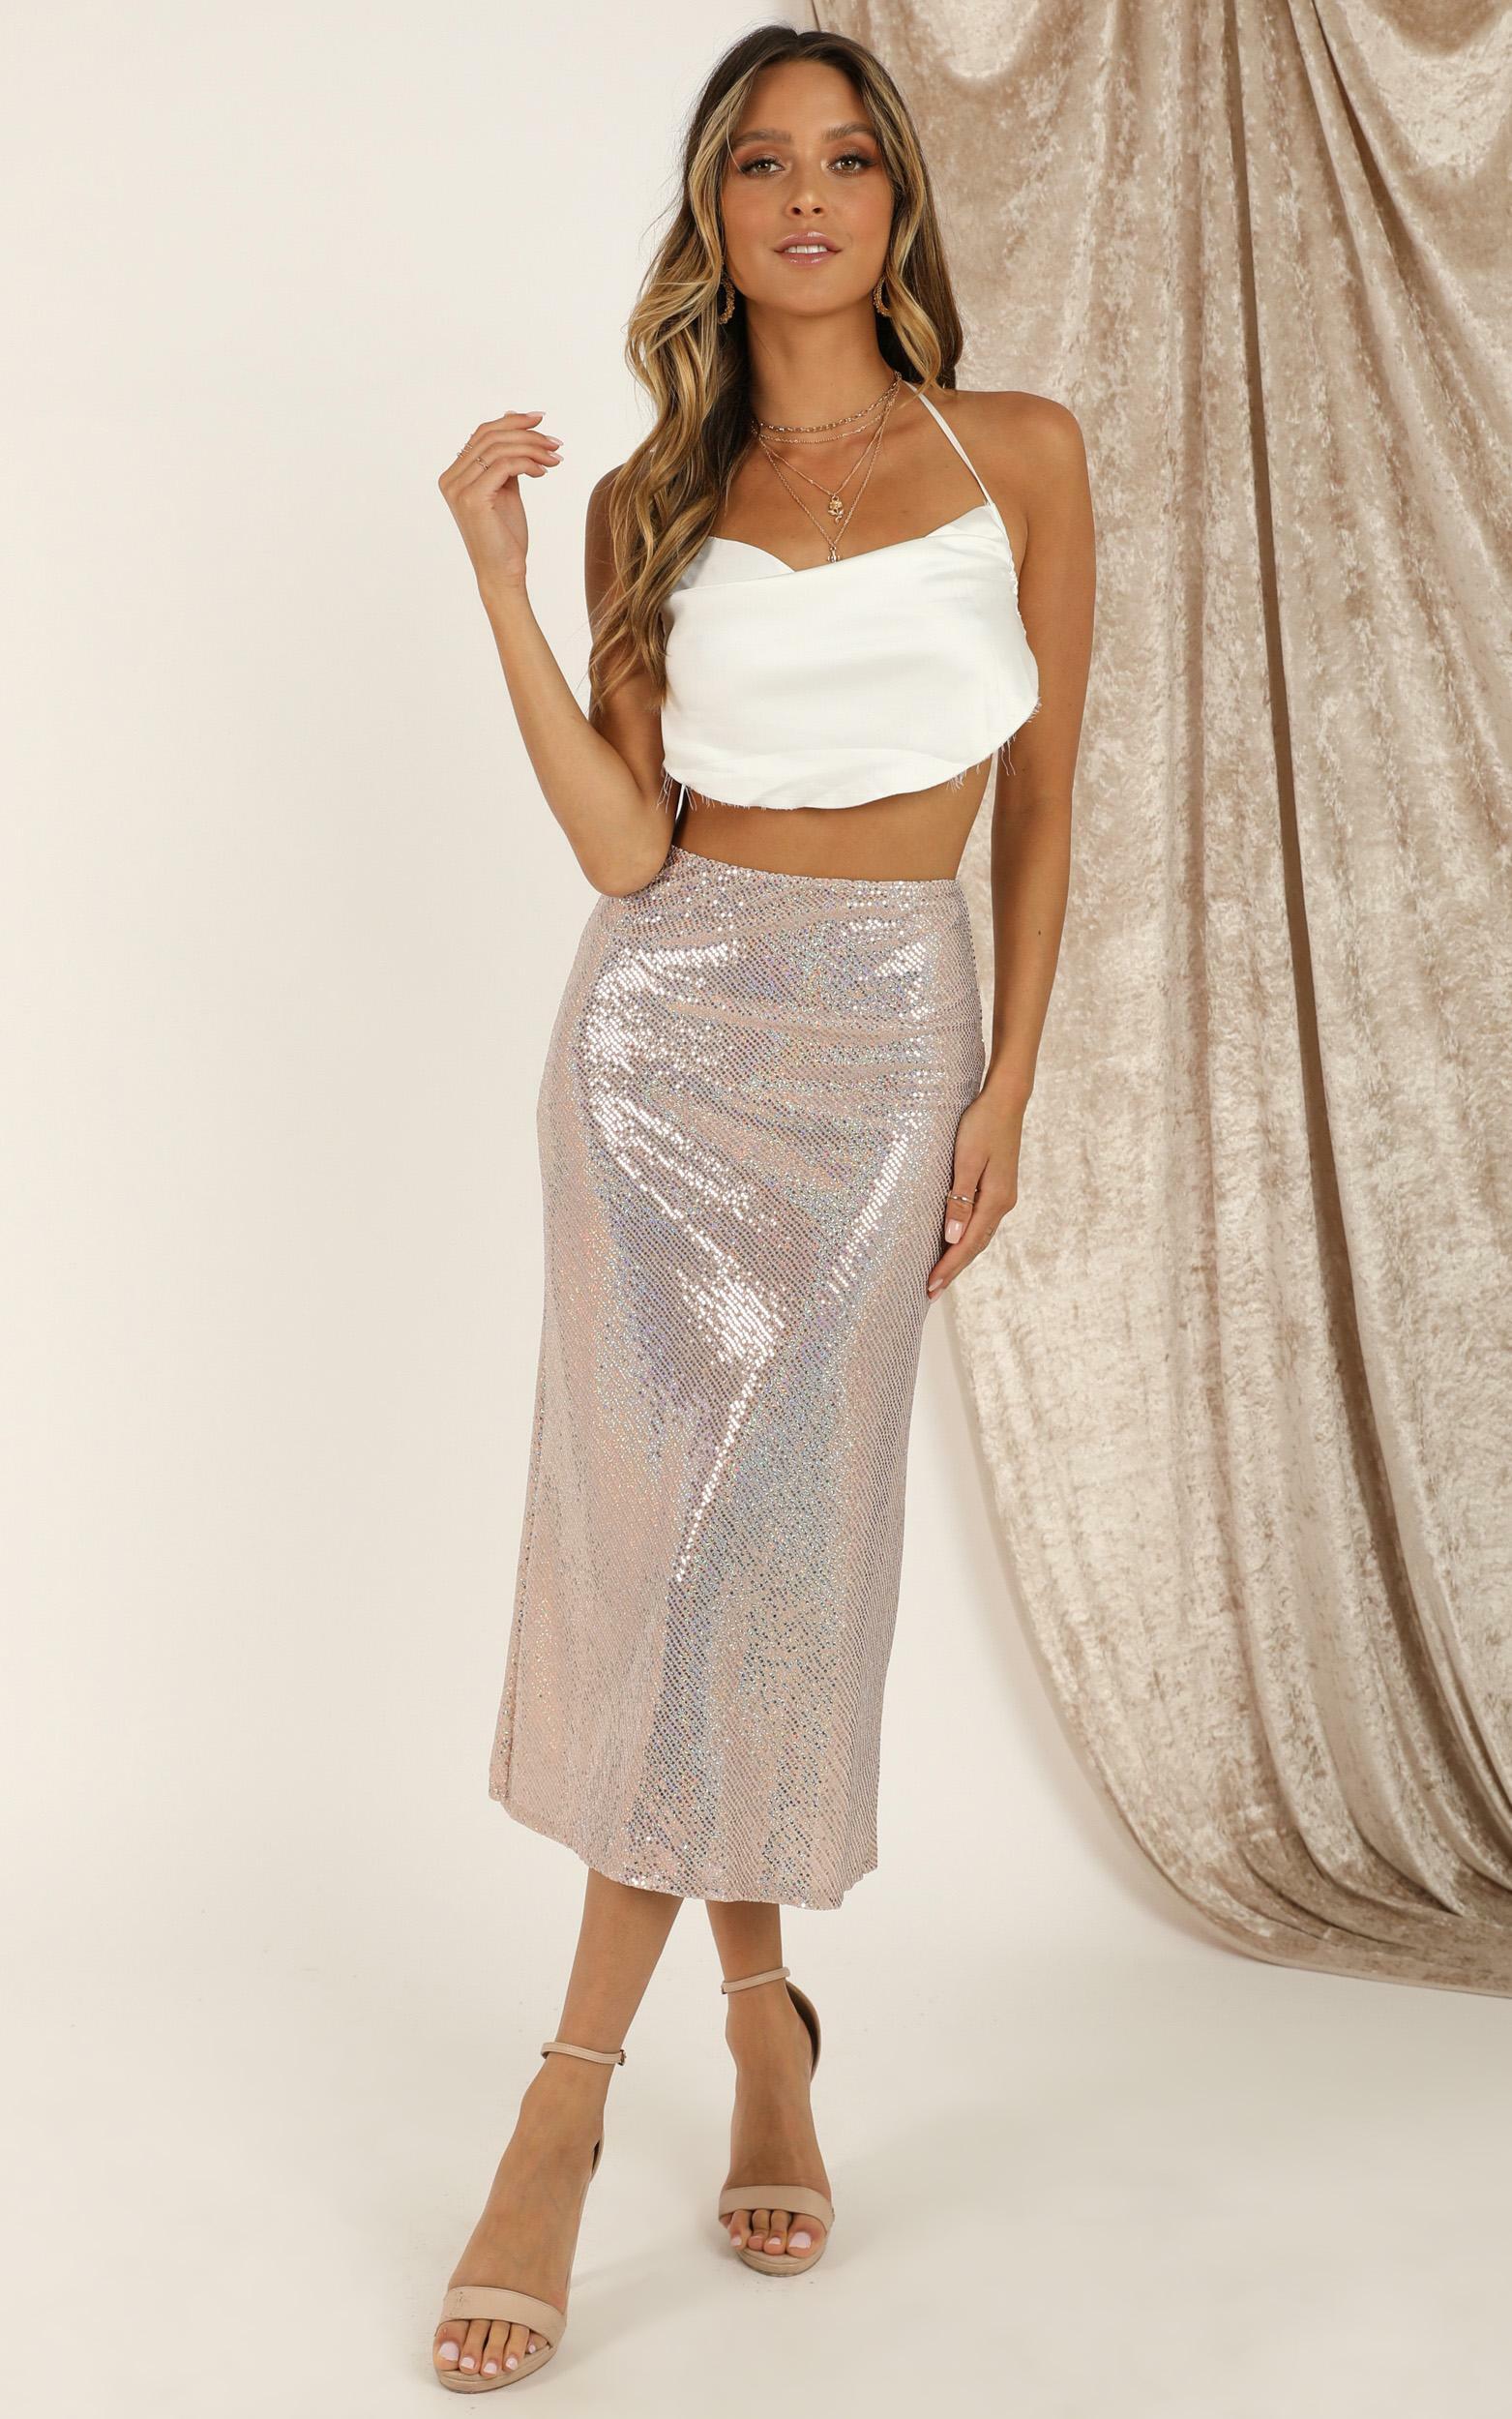 Unfailing Love skirt in blush - 12 (L), Blush, hi-res image number null